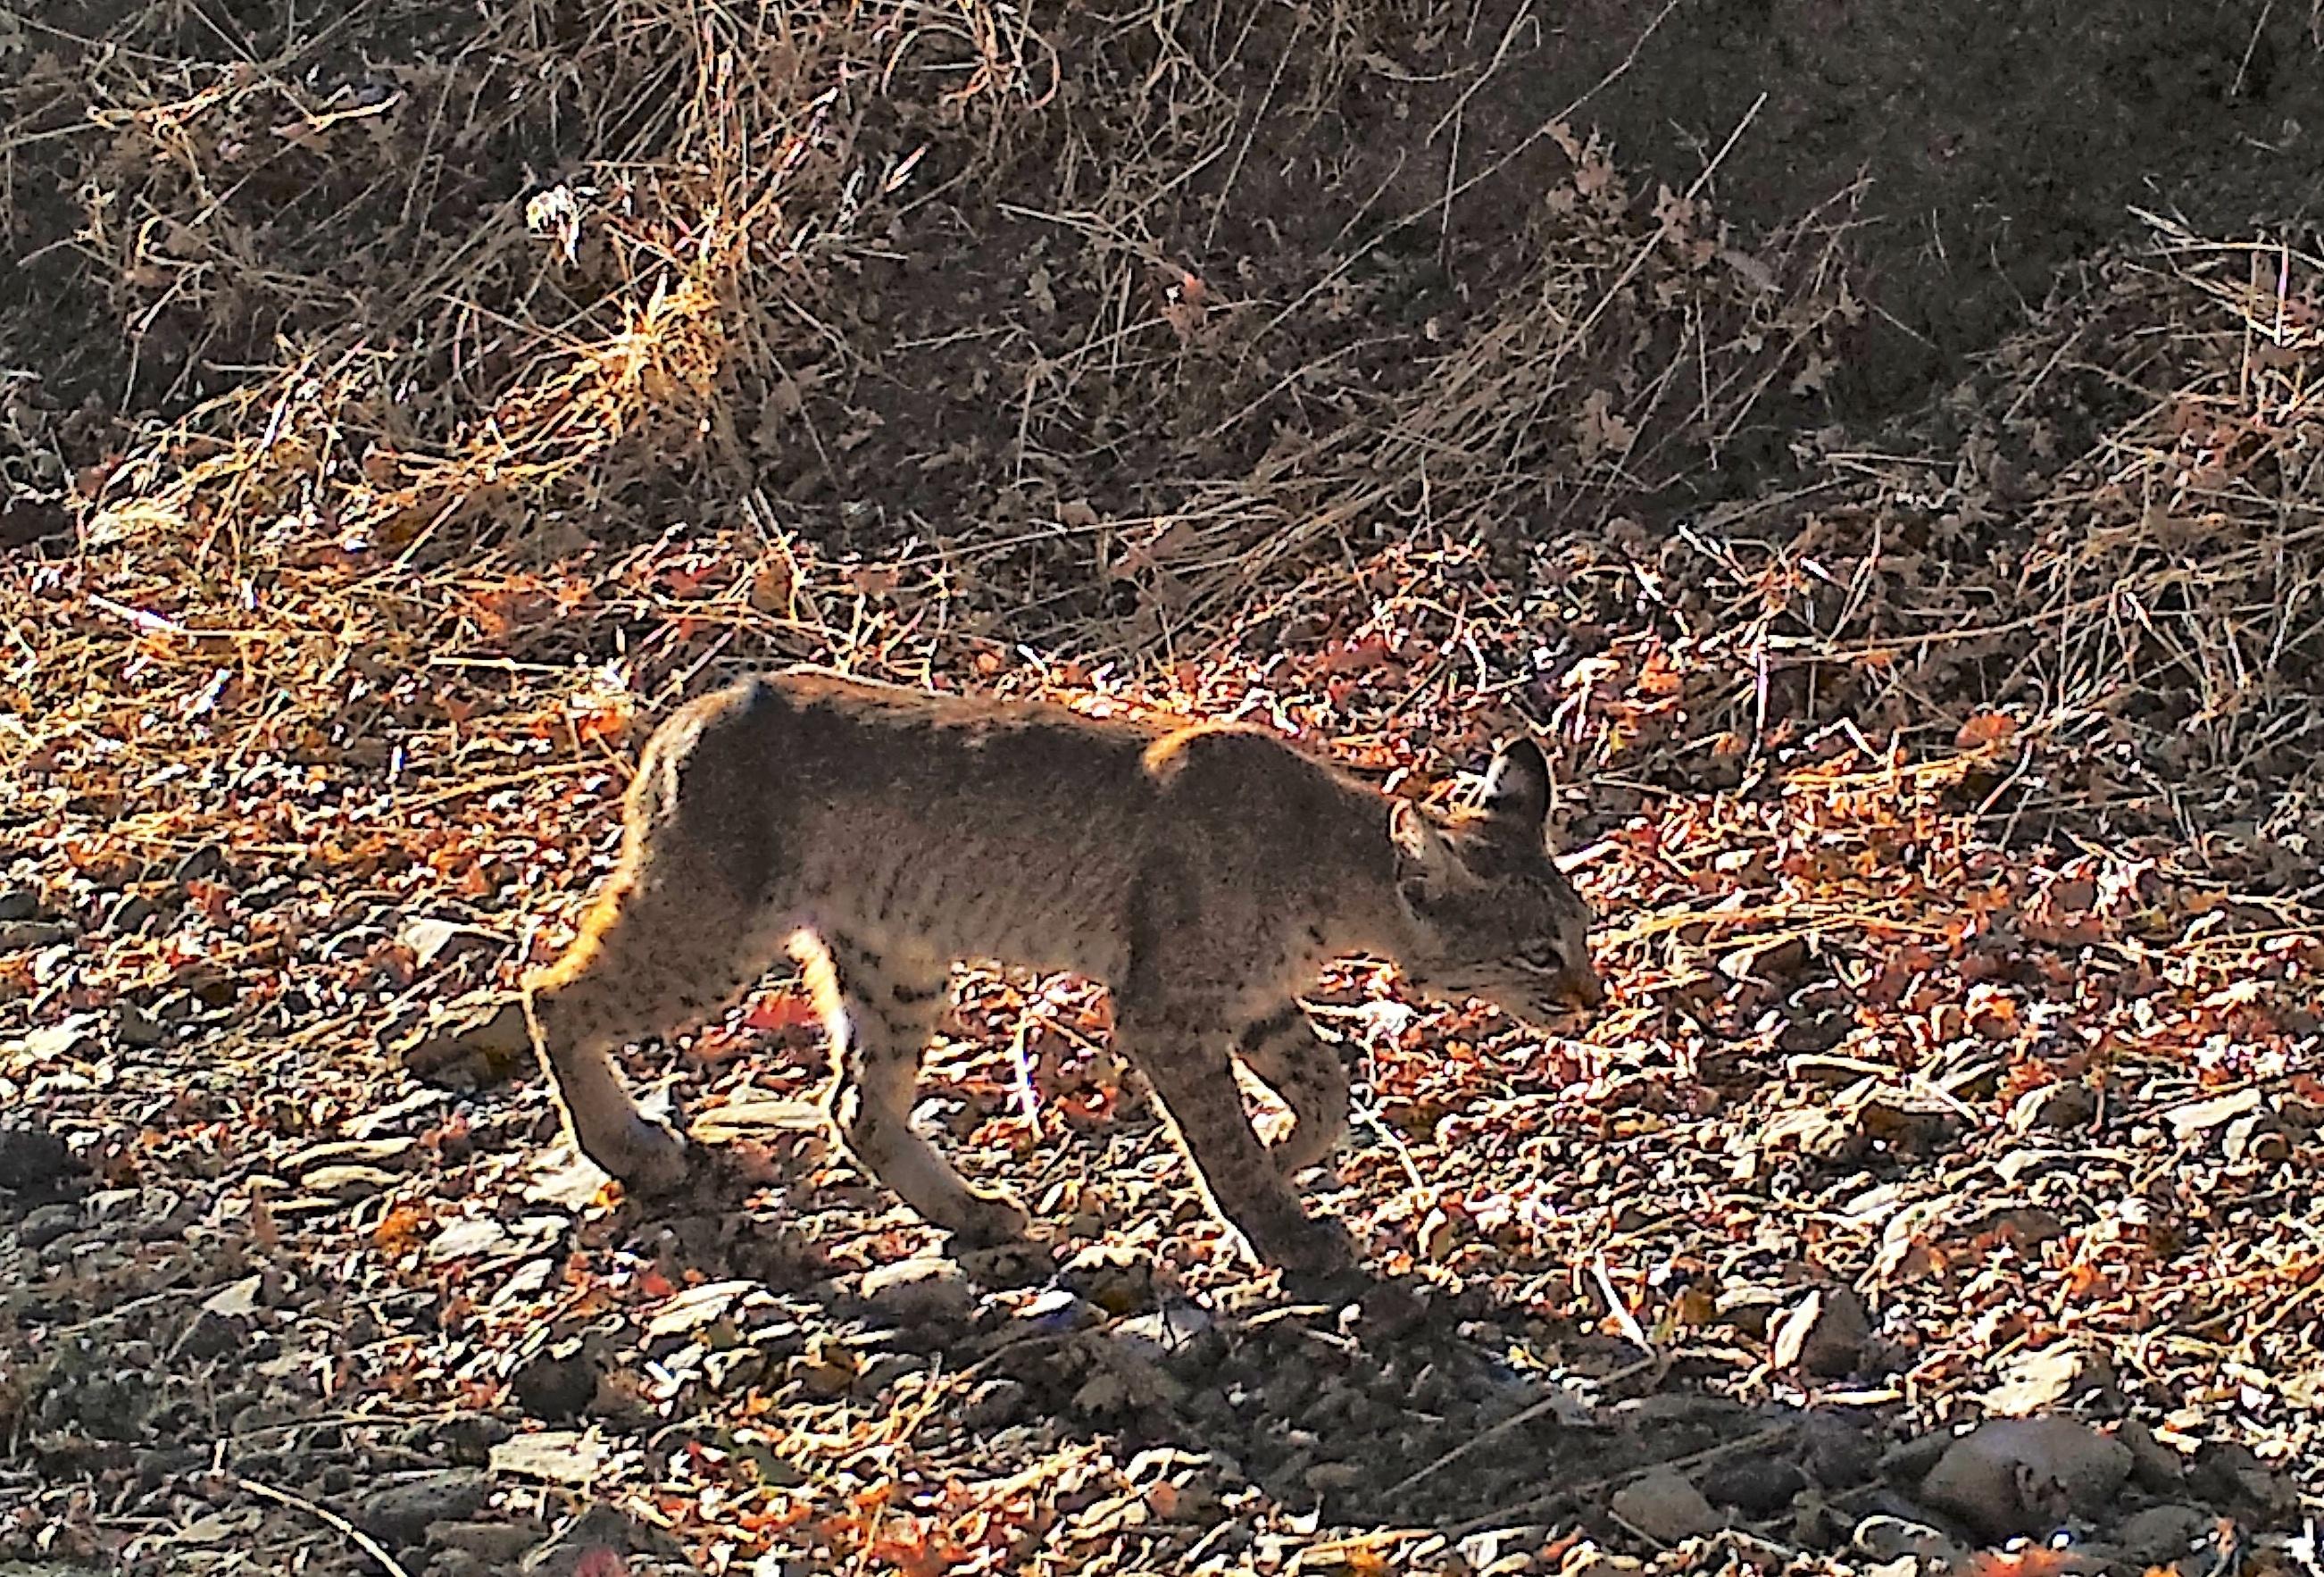 Bobcat at OSA Preserve on 10-8-17-799626-edited.jpg